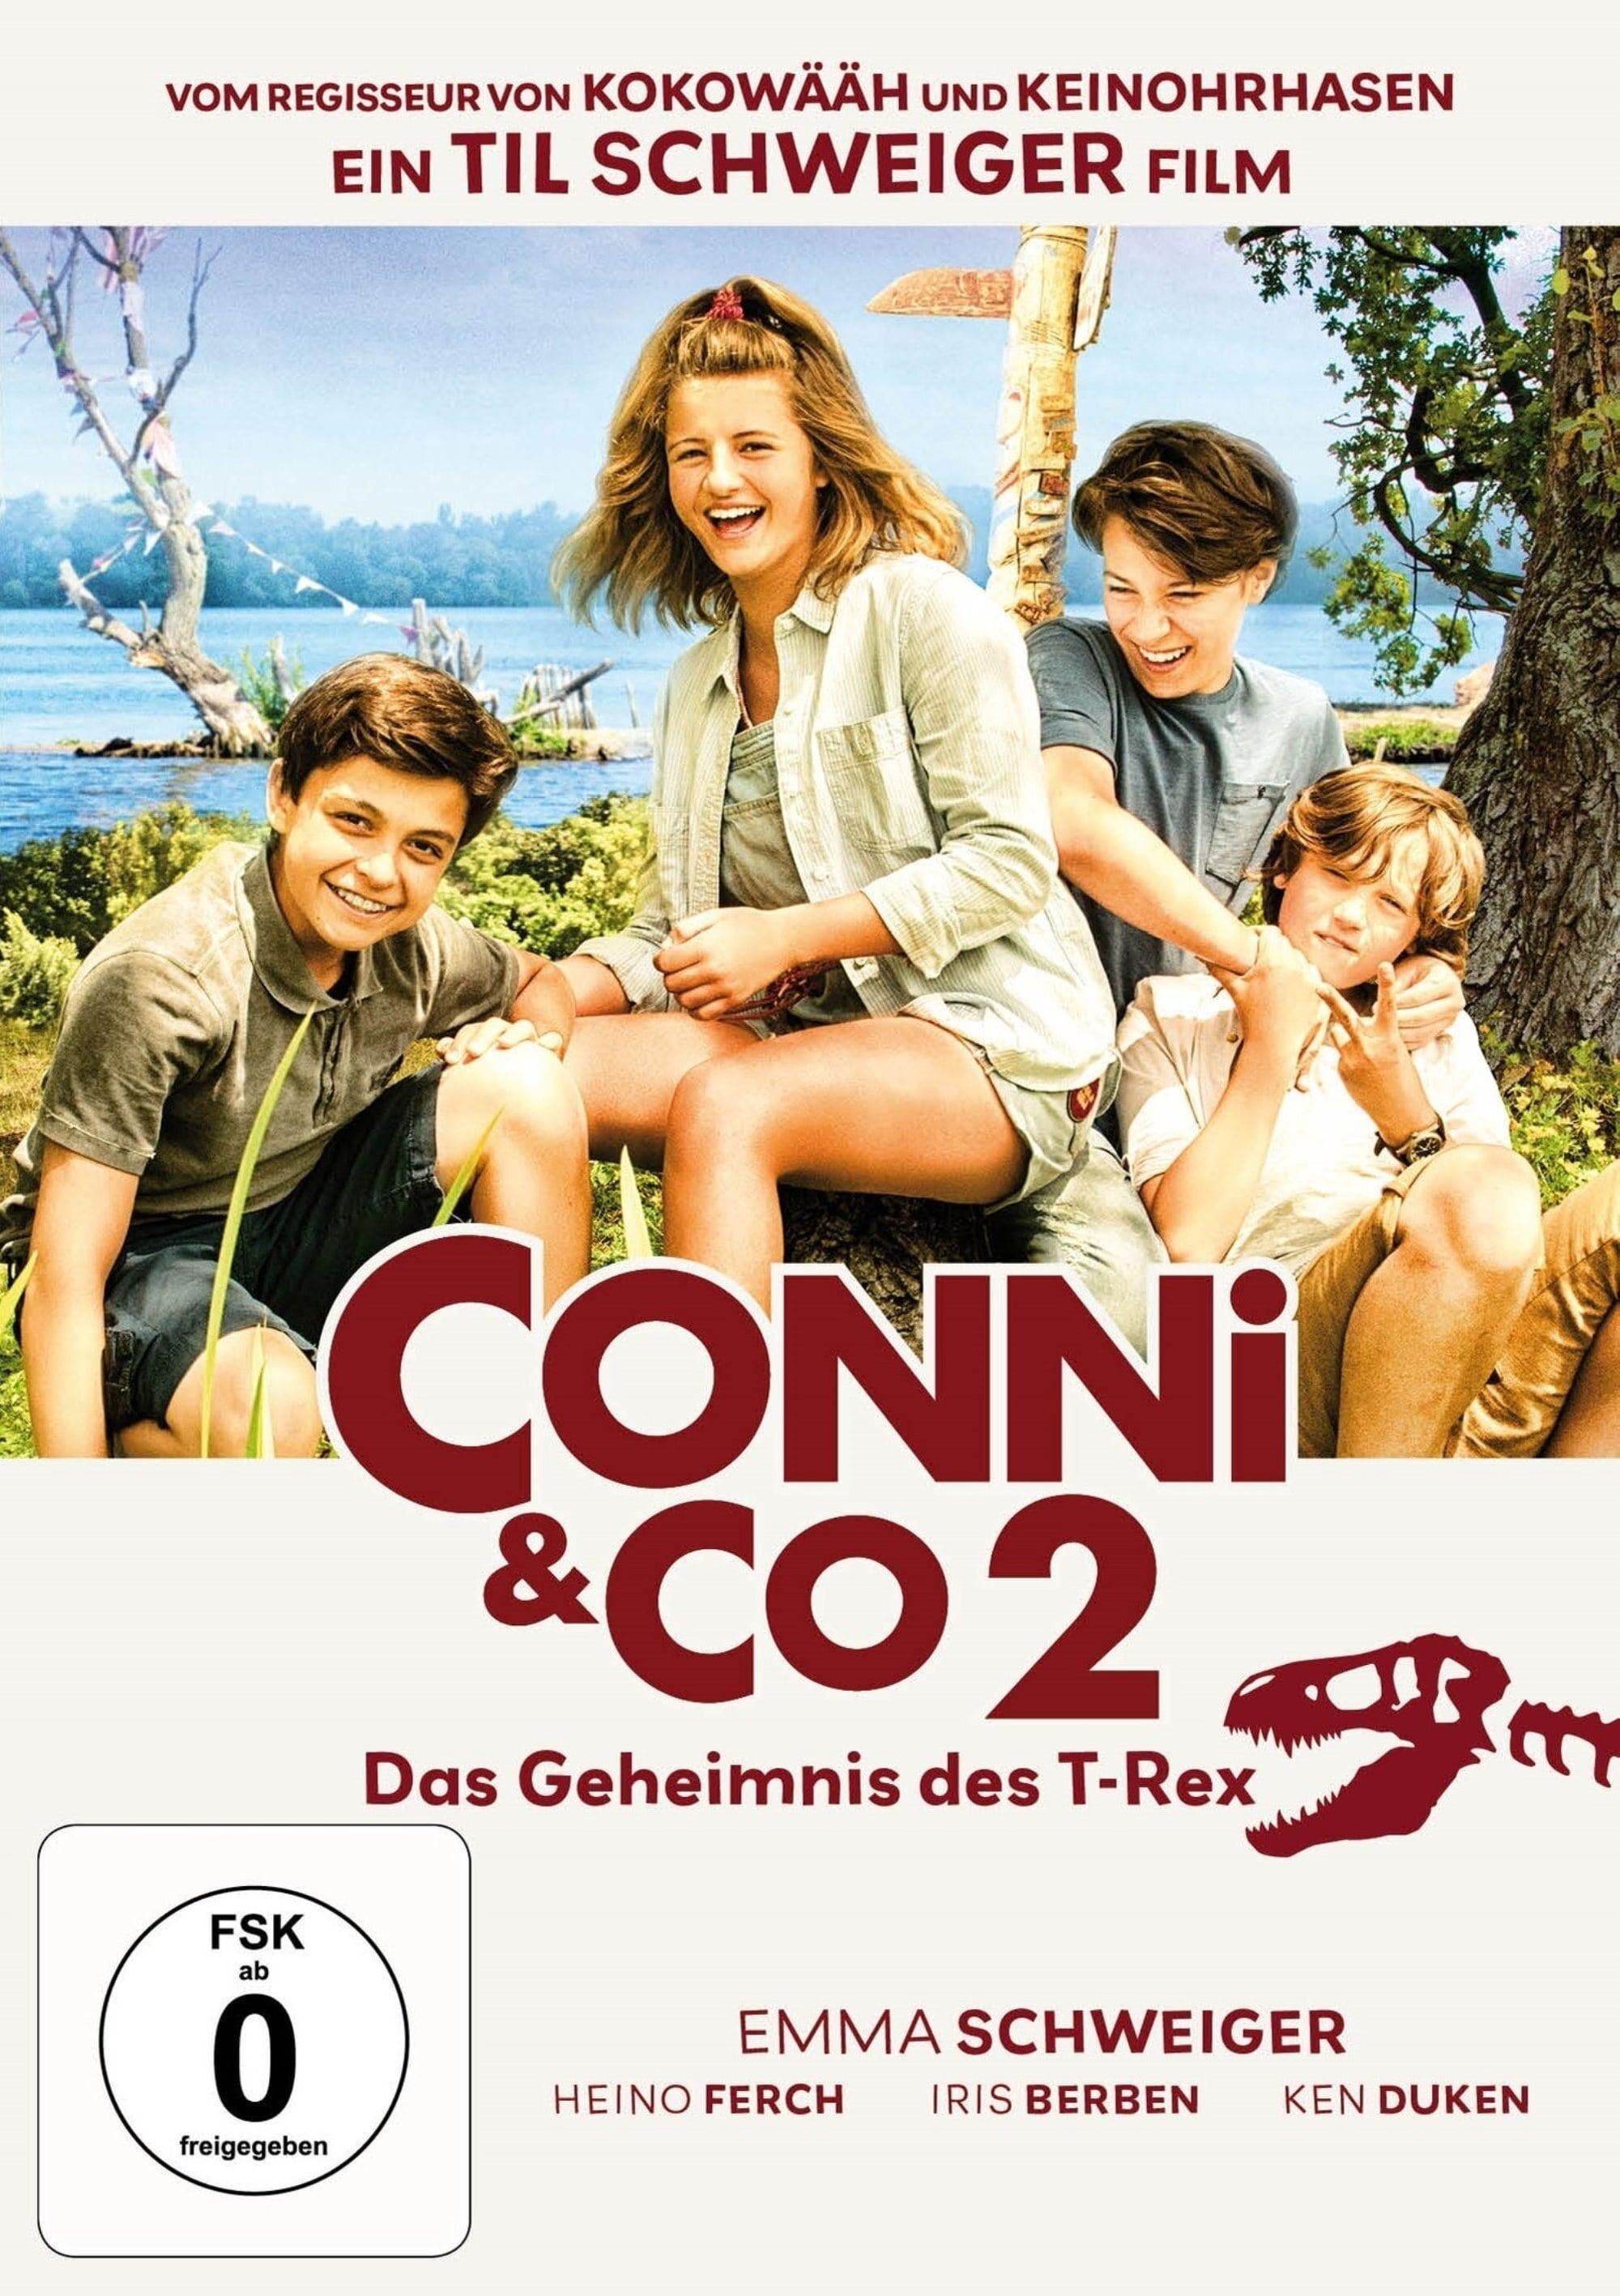 Conni & Co. 2 - The secret of the T-Rex